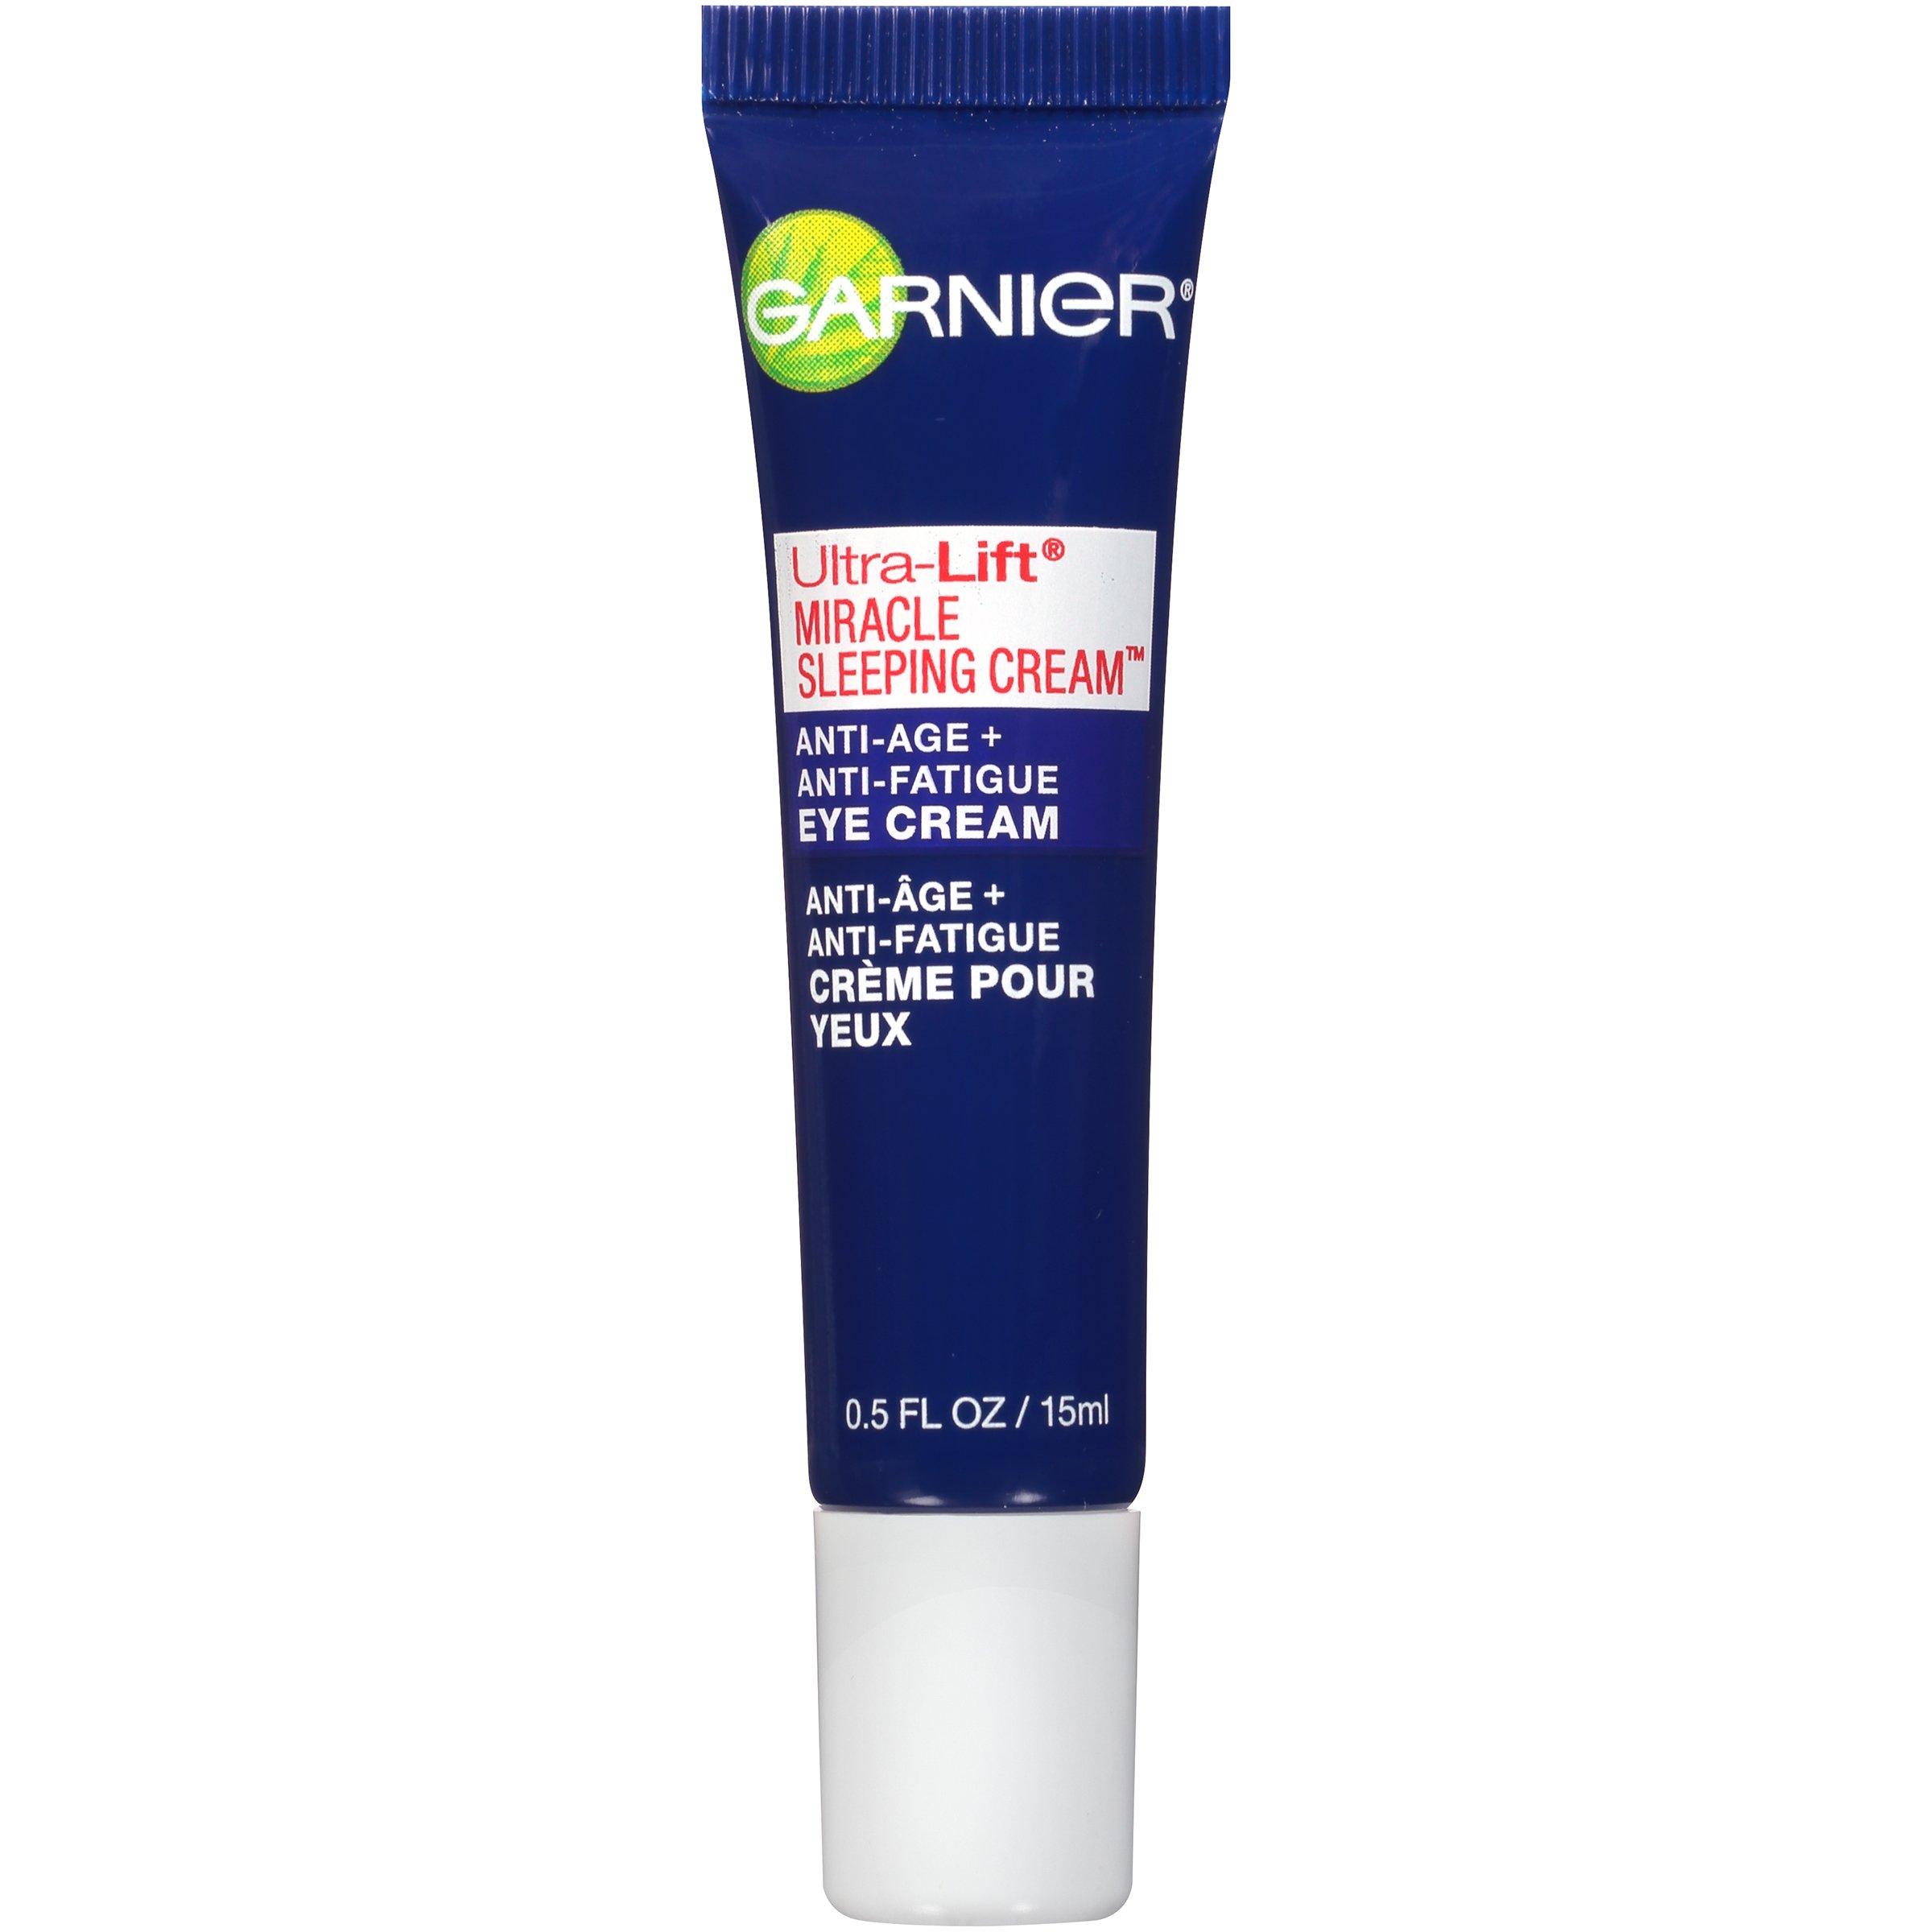 Garnier Ultra-Lift Miracle Sleeping Cream Anti-Age + Anti-Fatigue Eye Cream 0.50 oz